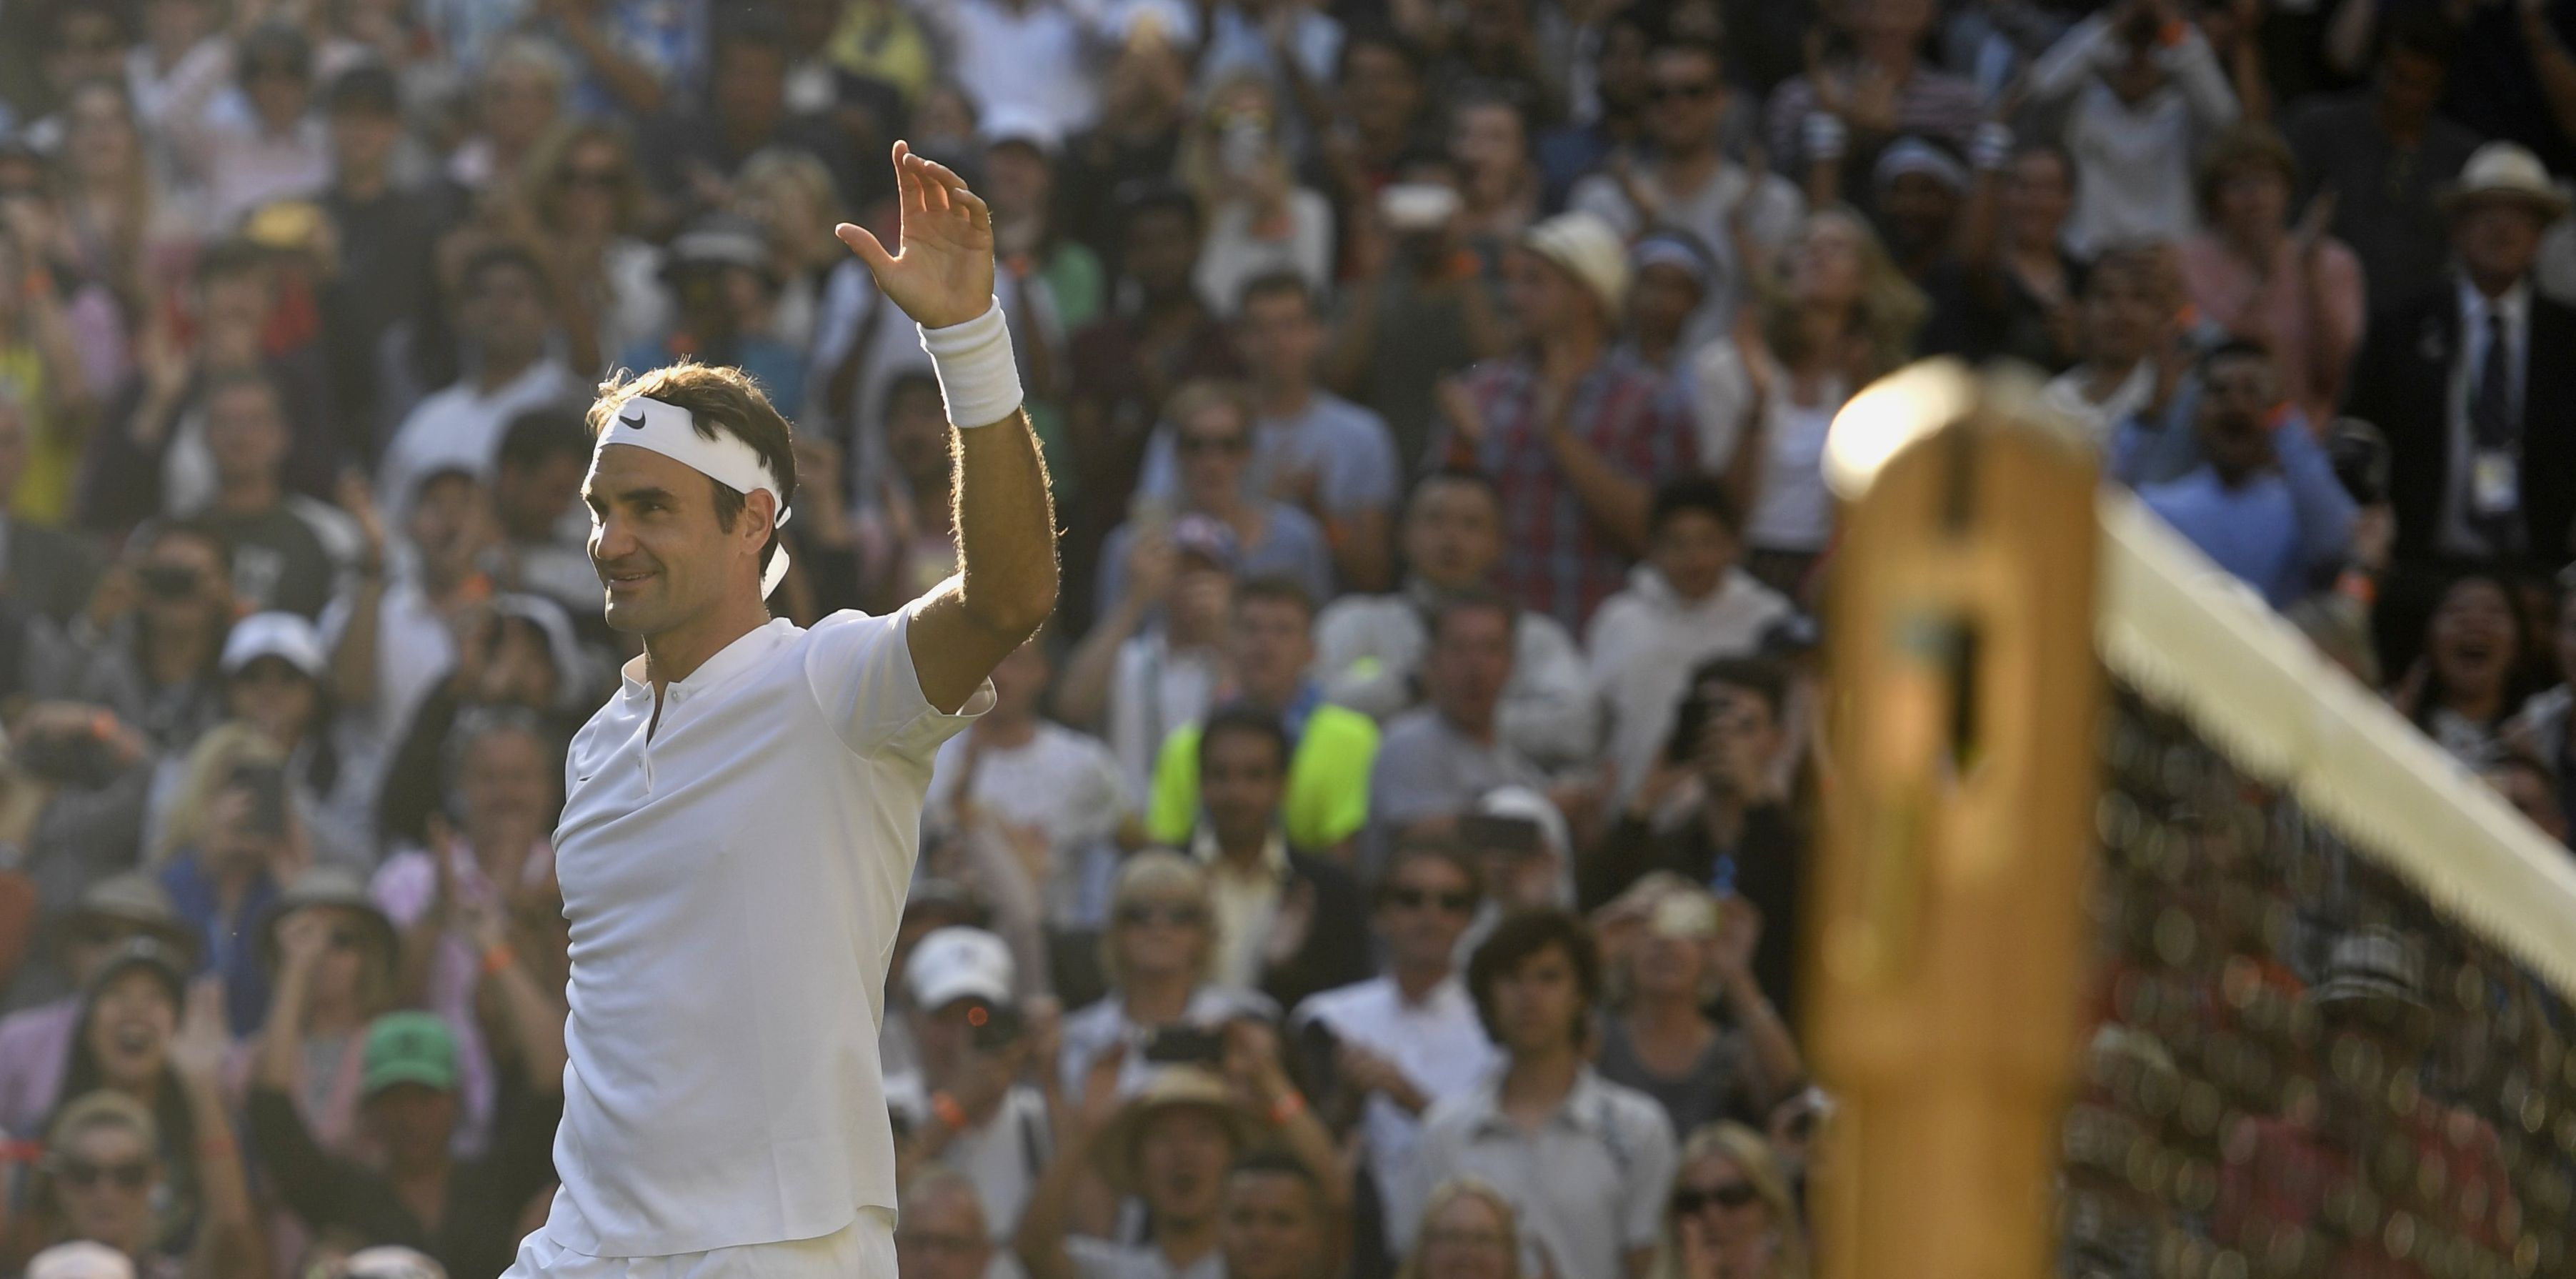 WIMBLEDON Federer zborio svoje rekordno 12. polufinale u Londonu